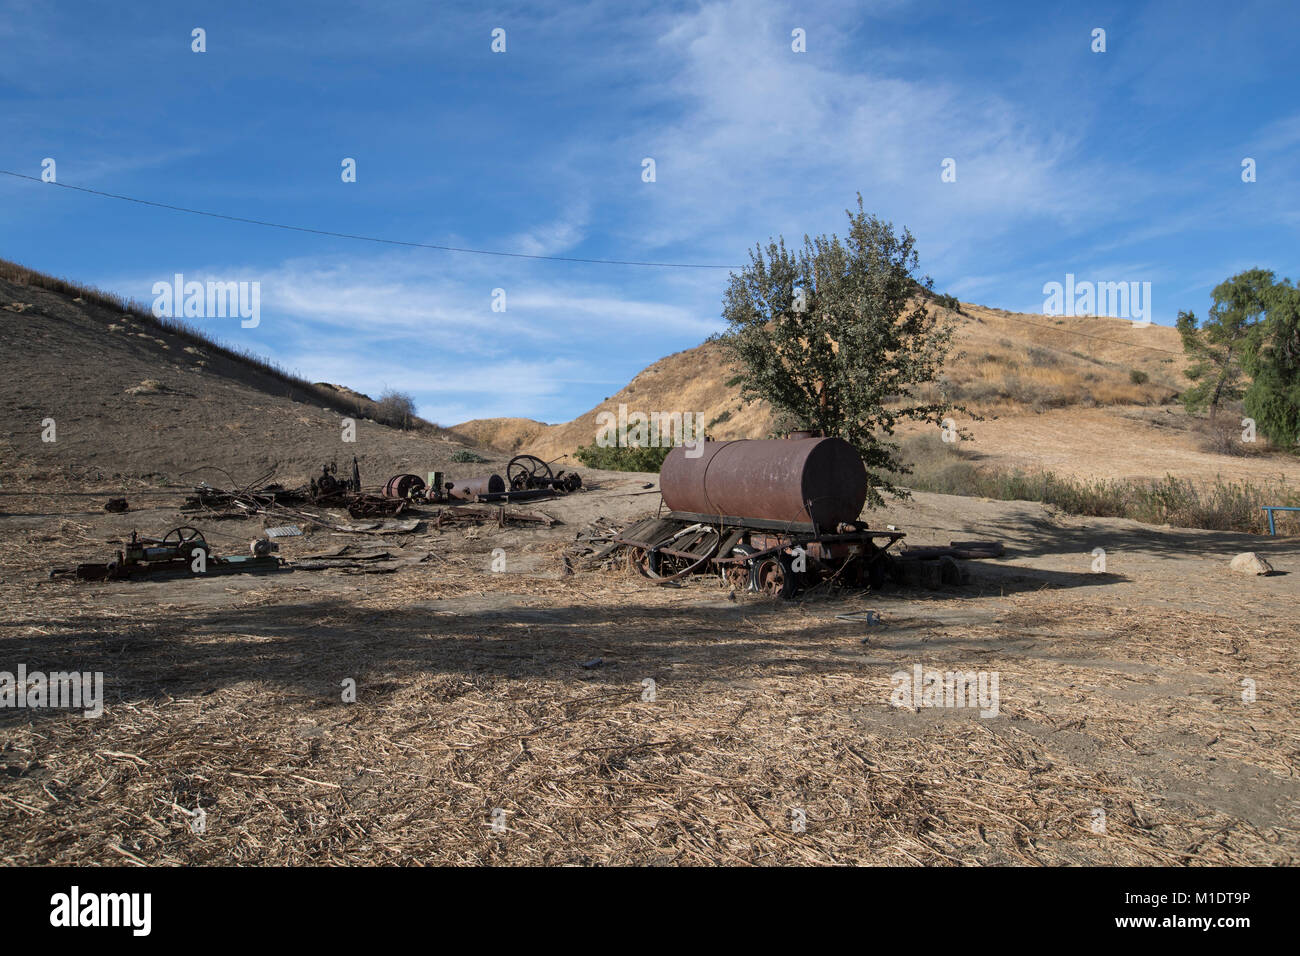 Abandoned farm equipment and farmland, Mentryville, Pico Canyon, LA County - Stock Image